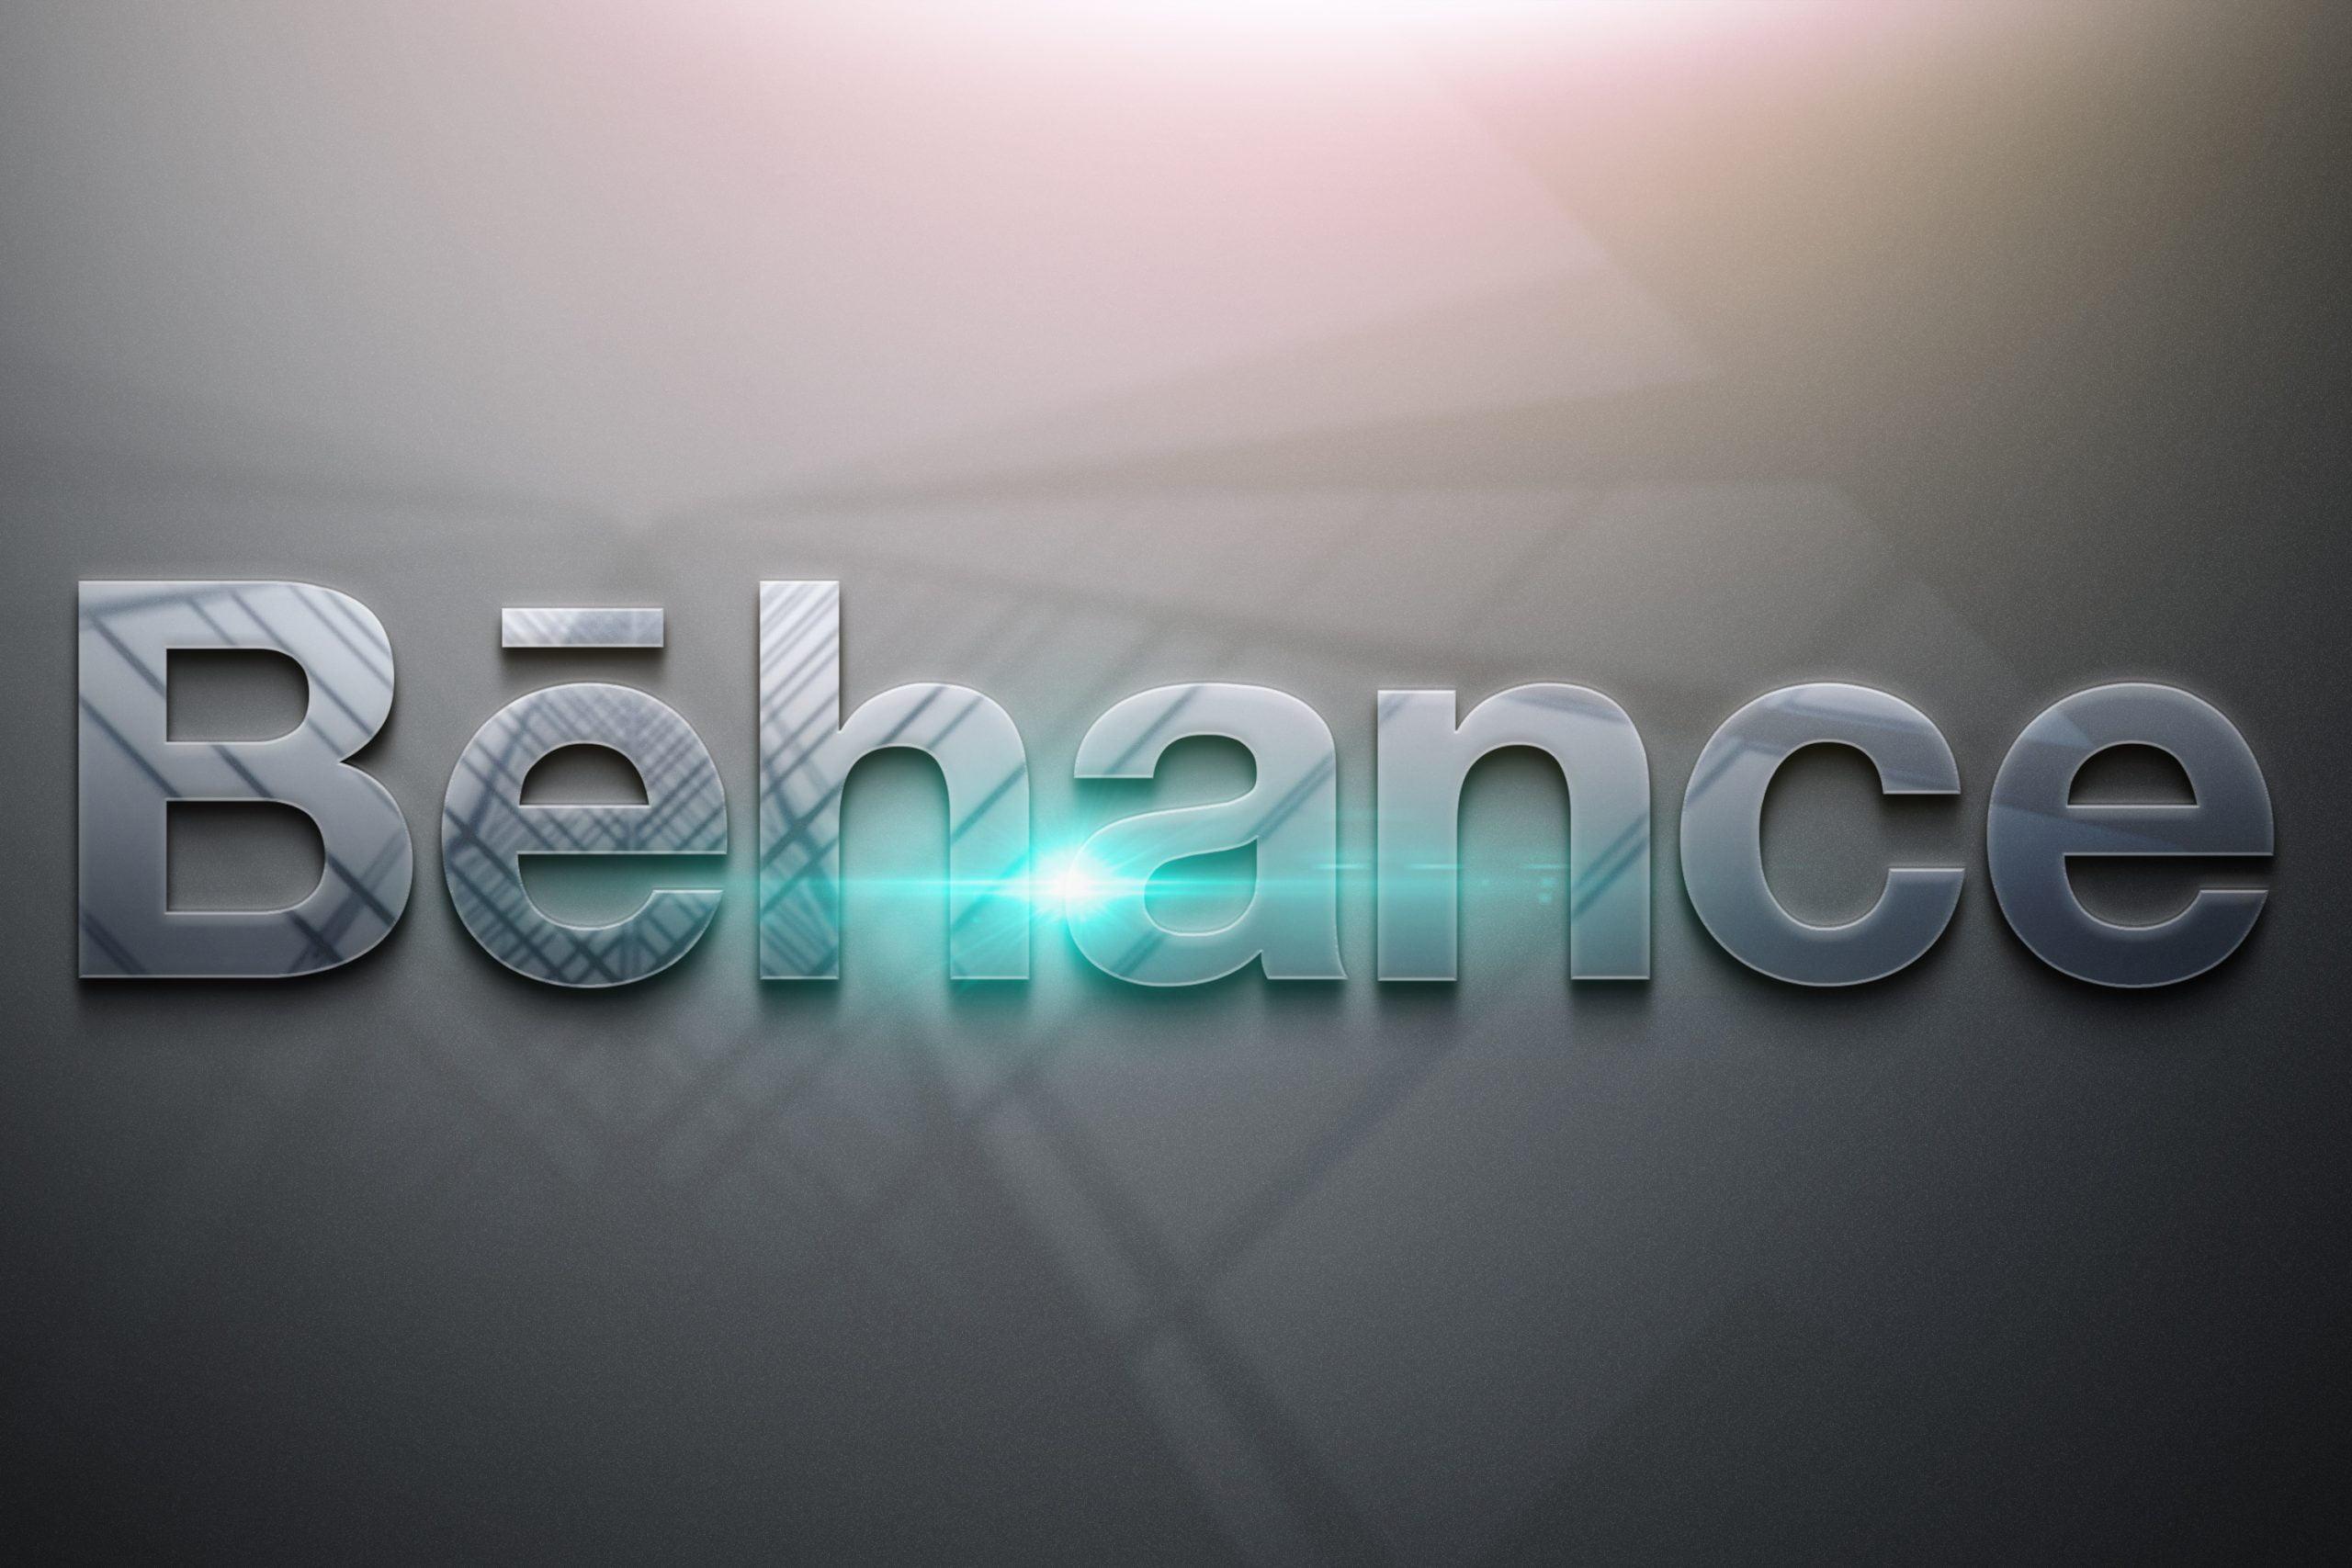 Behance-Free-Photoshop-Glossy-3D-Logo-Mockup